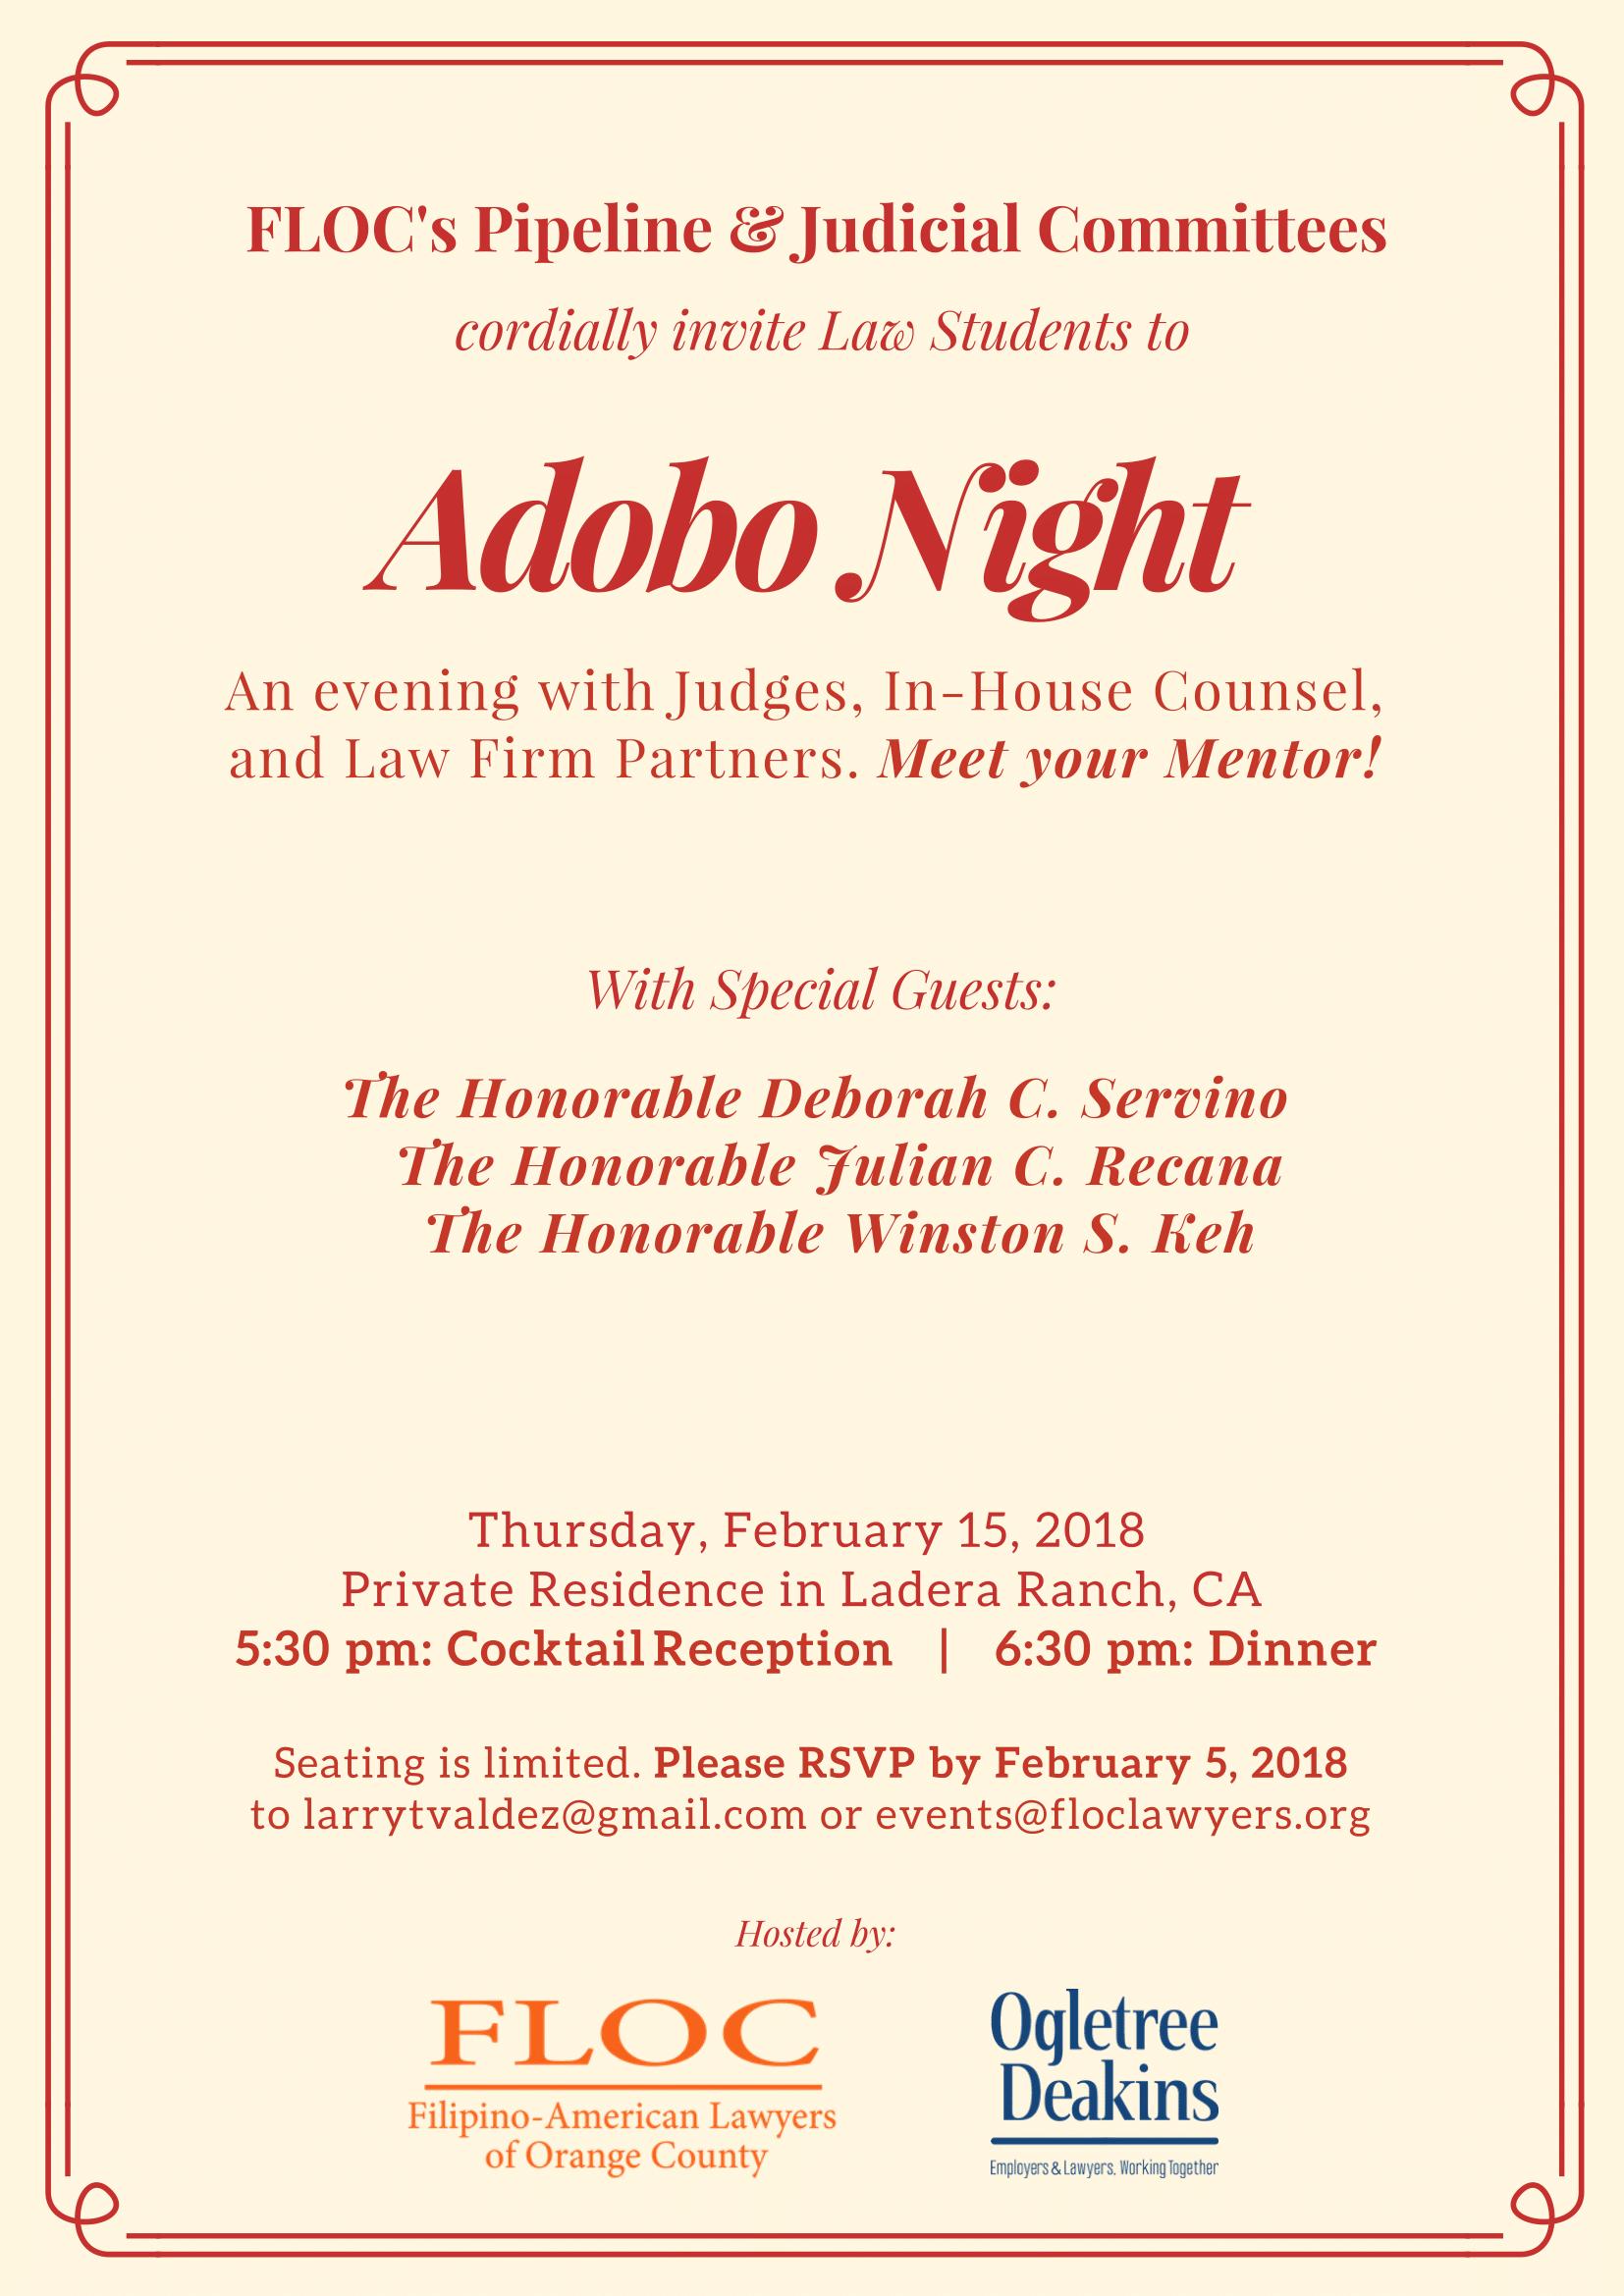 FLOC Adobo Night 2-15-2018-1.png